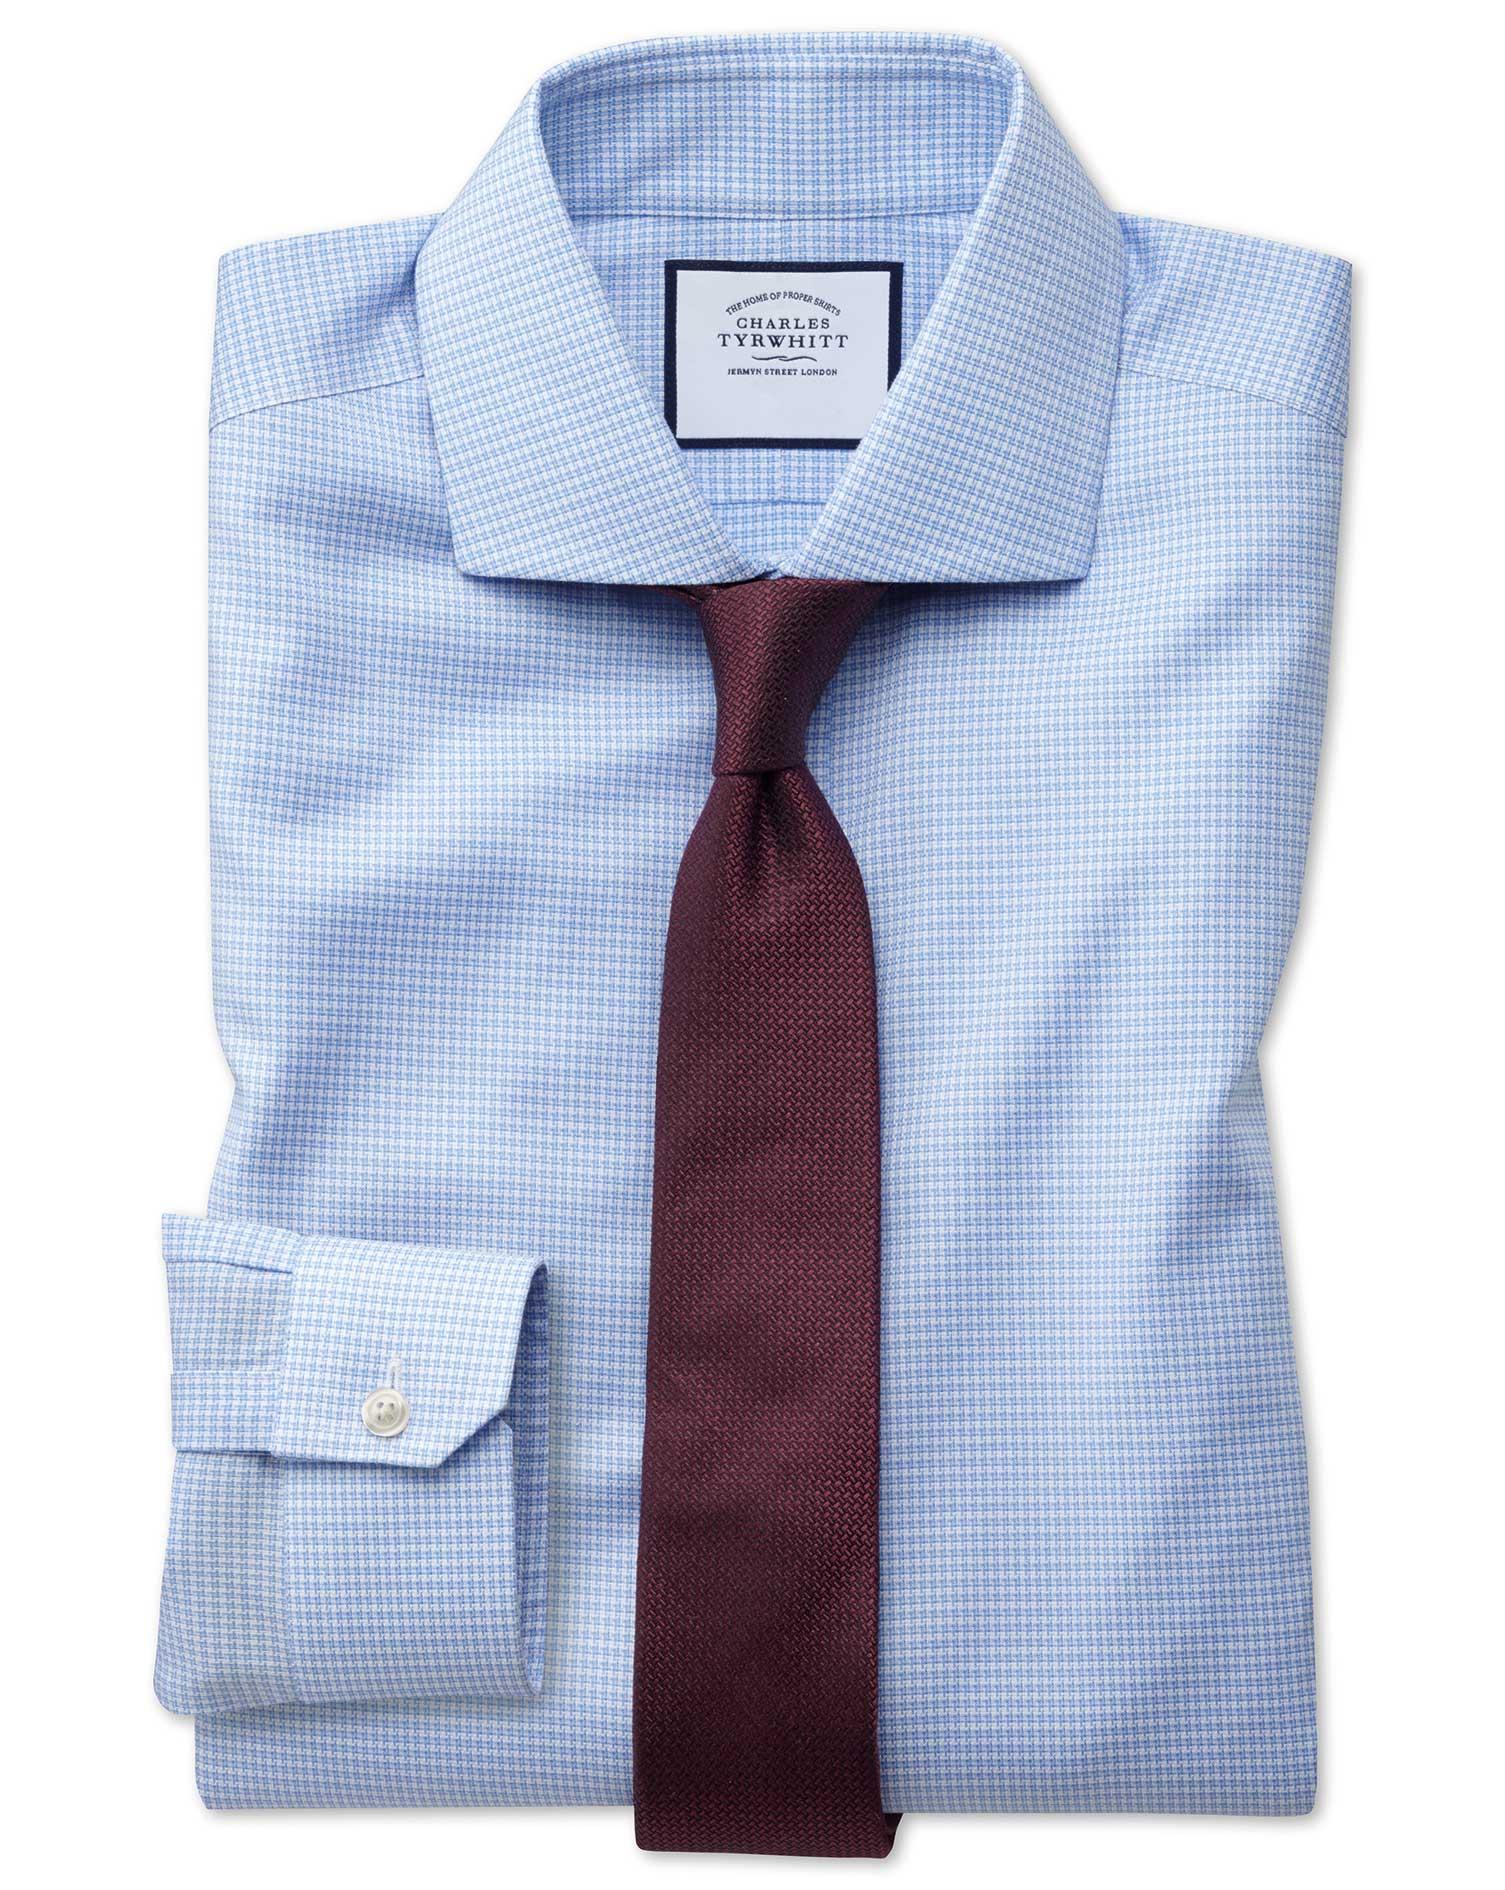 1f0d6e4c Super slim fit non-iron sky blue puppytooth Oxford stretch shirt | Charles  Tyrwhitt